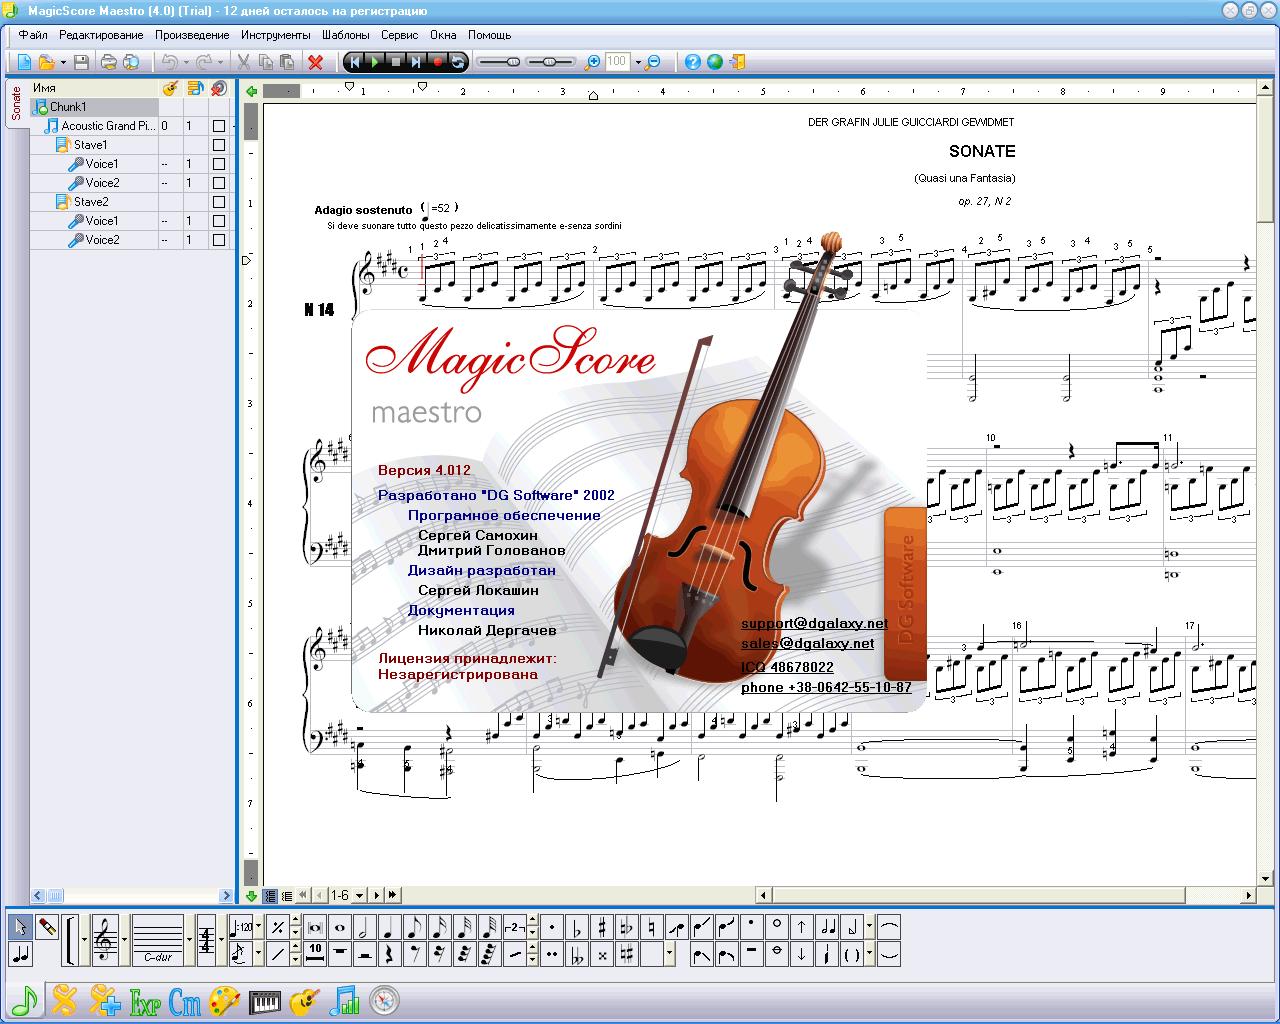 MagicScore Classic 6 music making software